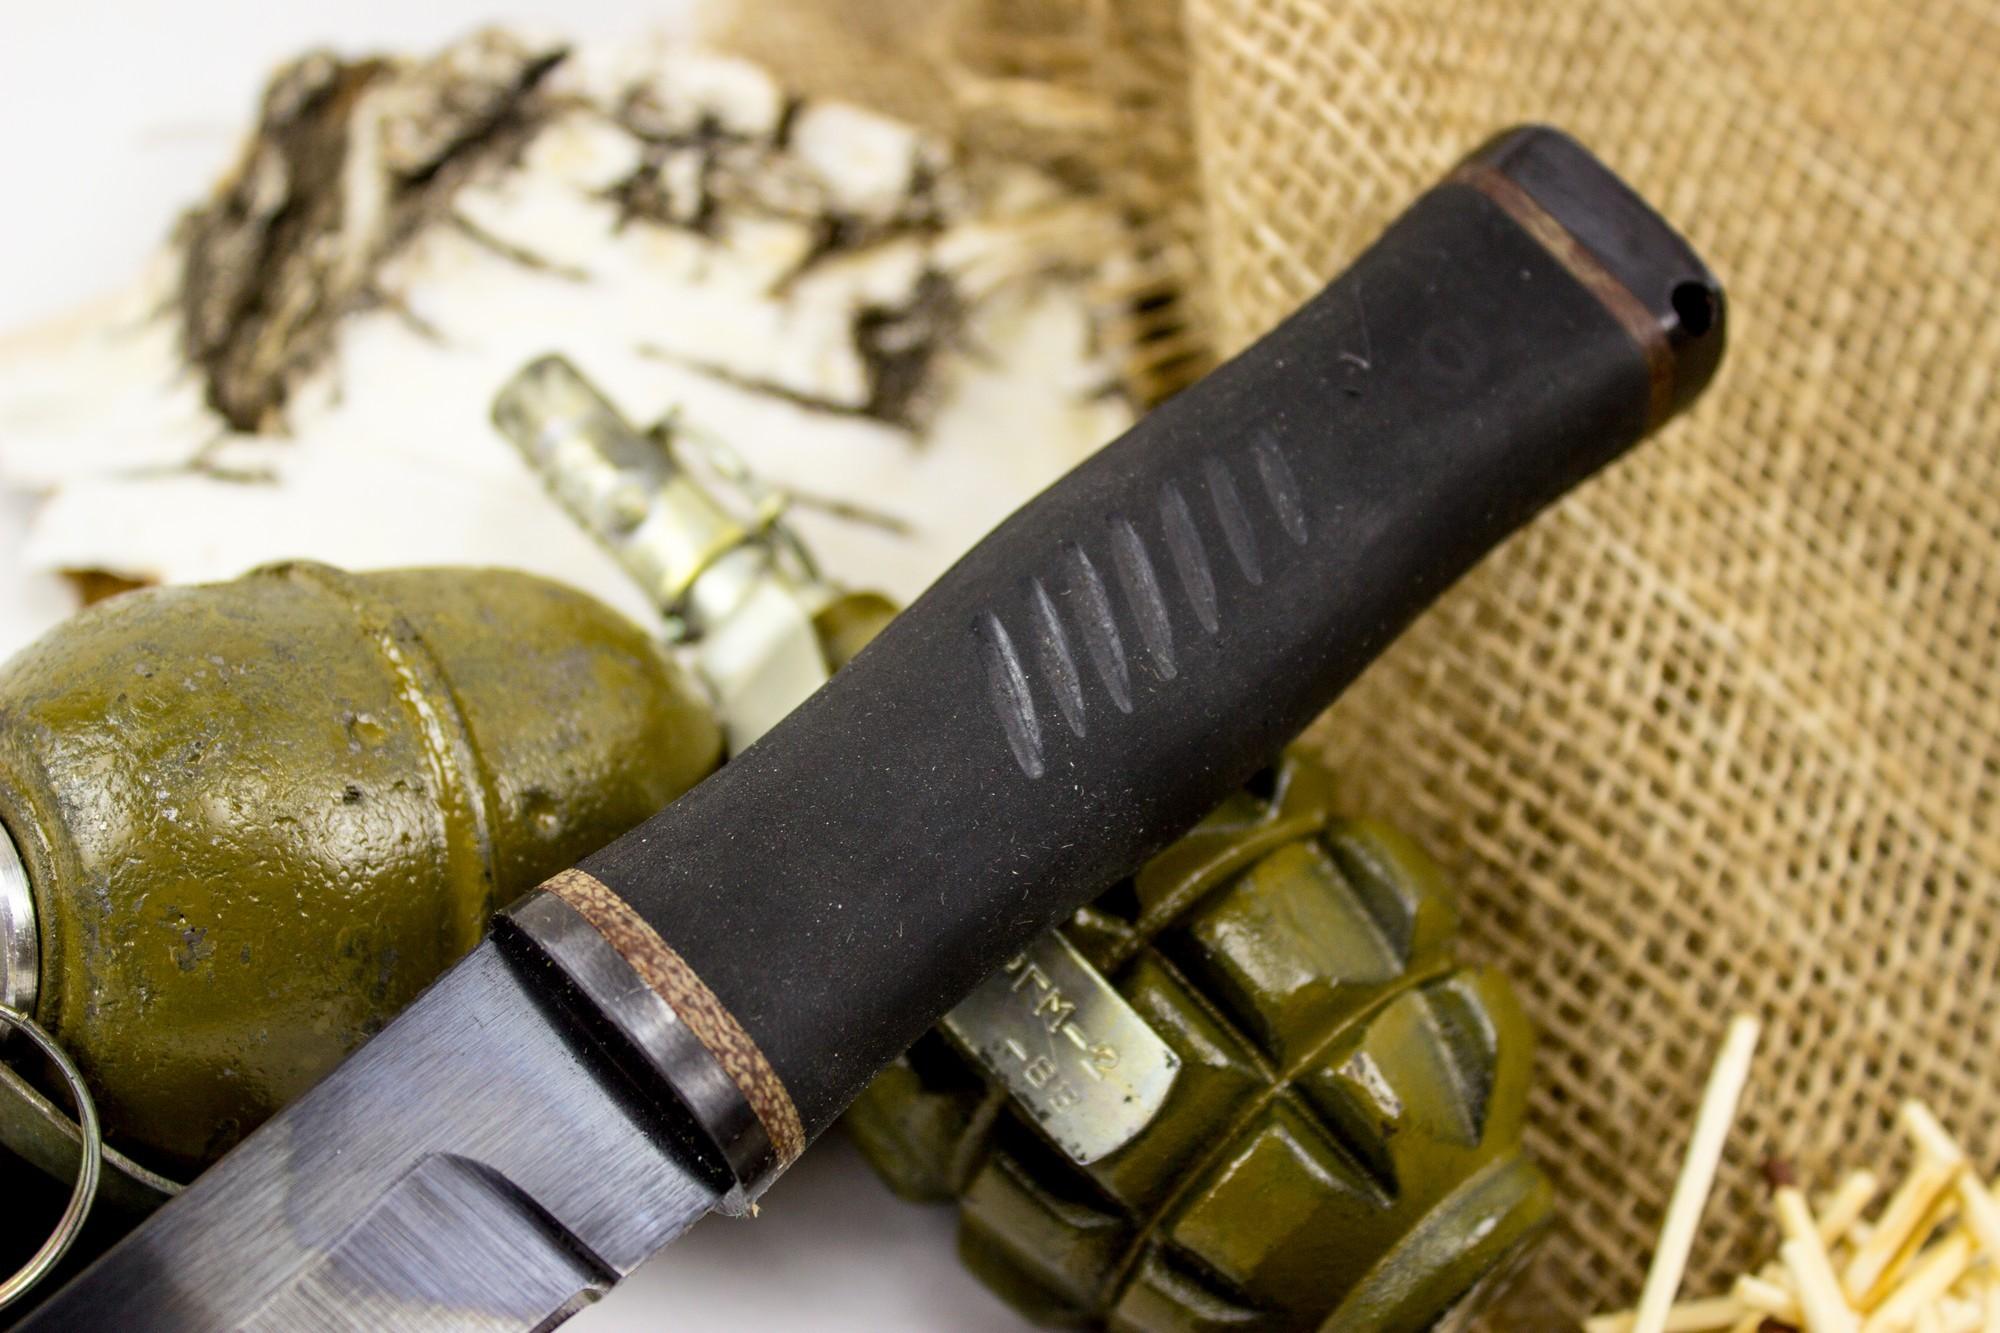 Фото 8 - Нож Кабан-1М, сталь 65Г, резина от Титов и Солдатова